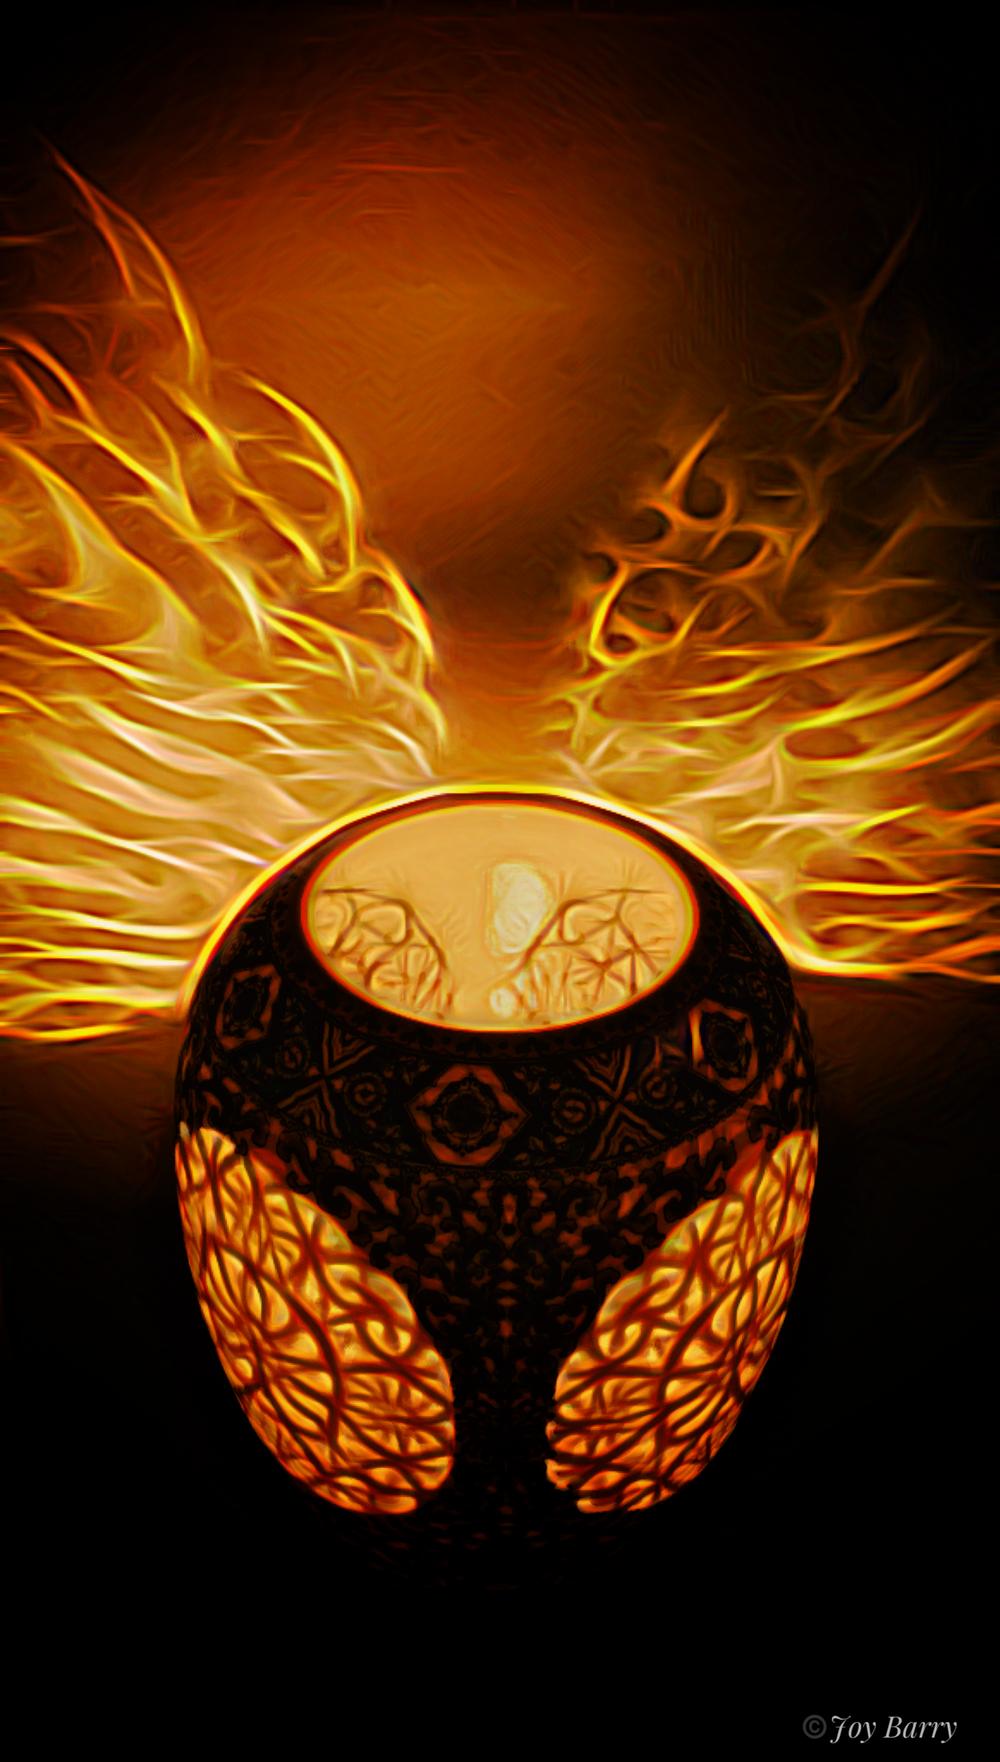 February 19, 2019 - Keep the light burning…